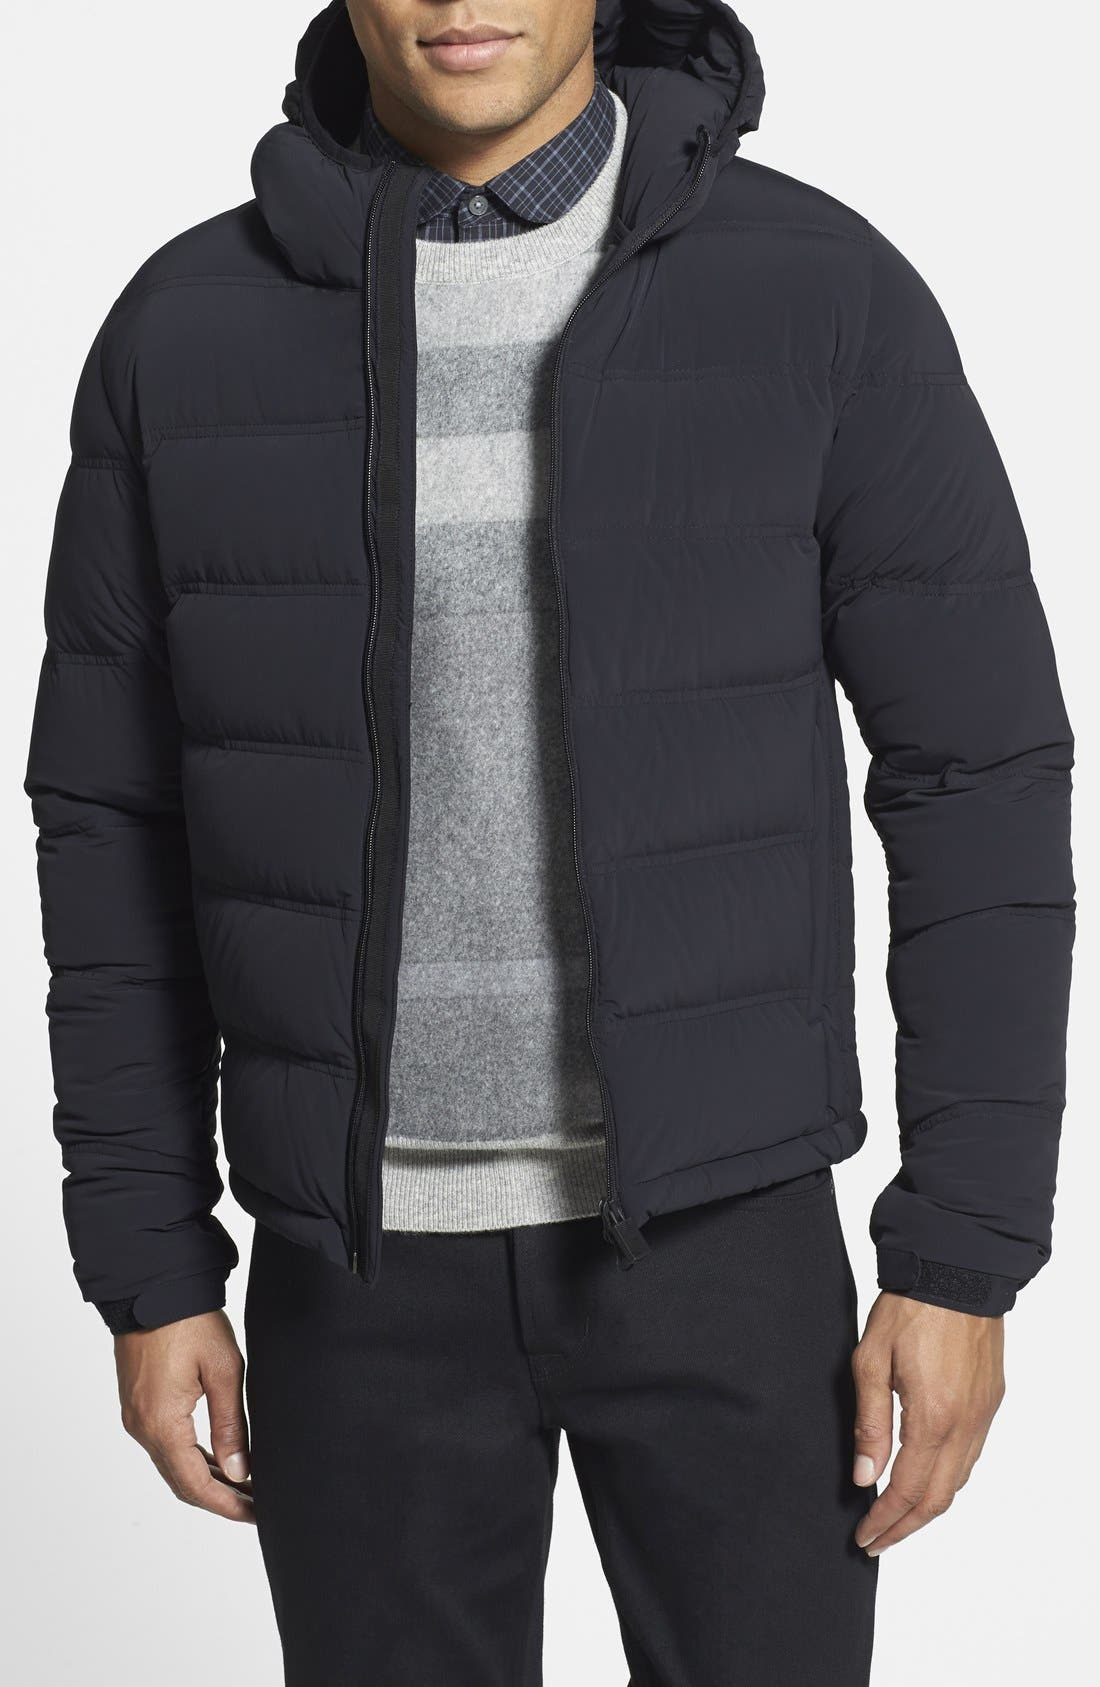 ASPESI 'Elastico' Trim Fit Hooded Puffer Jacket, Main, color, 001